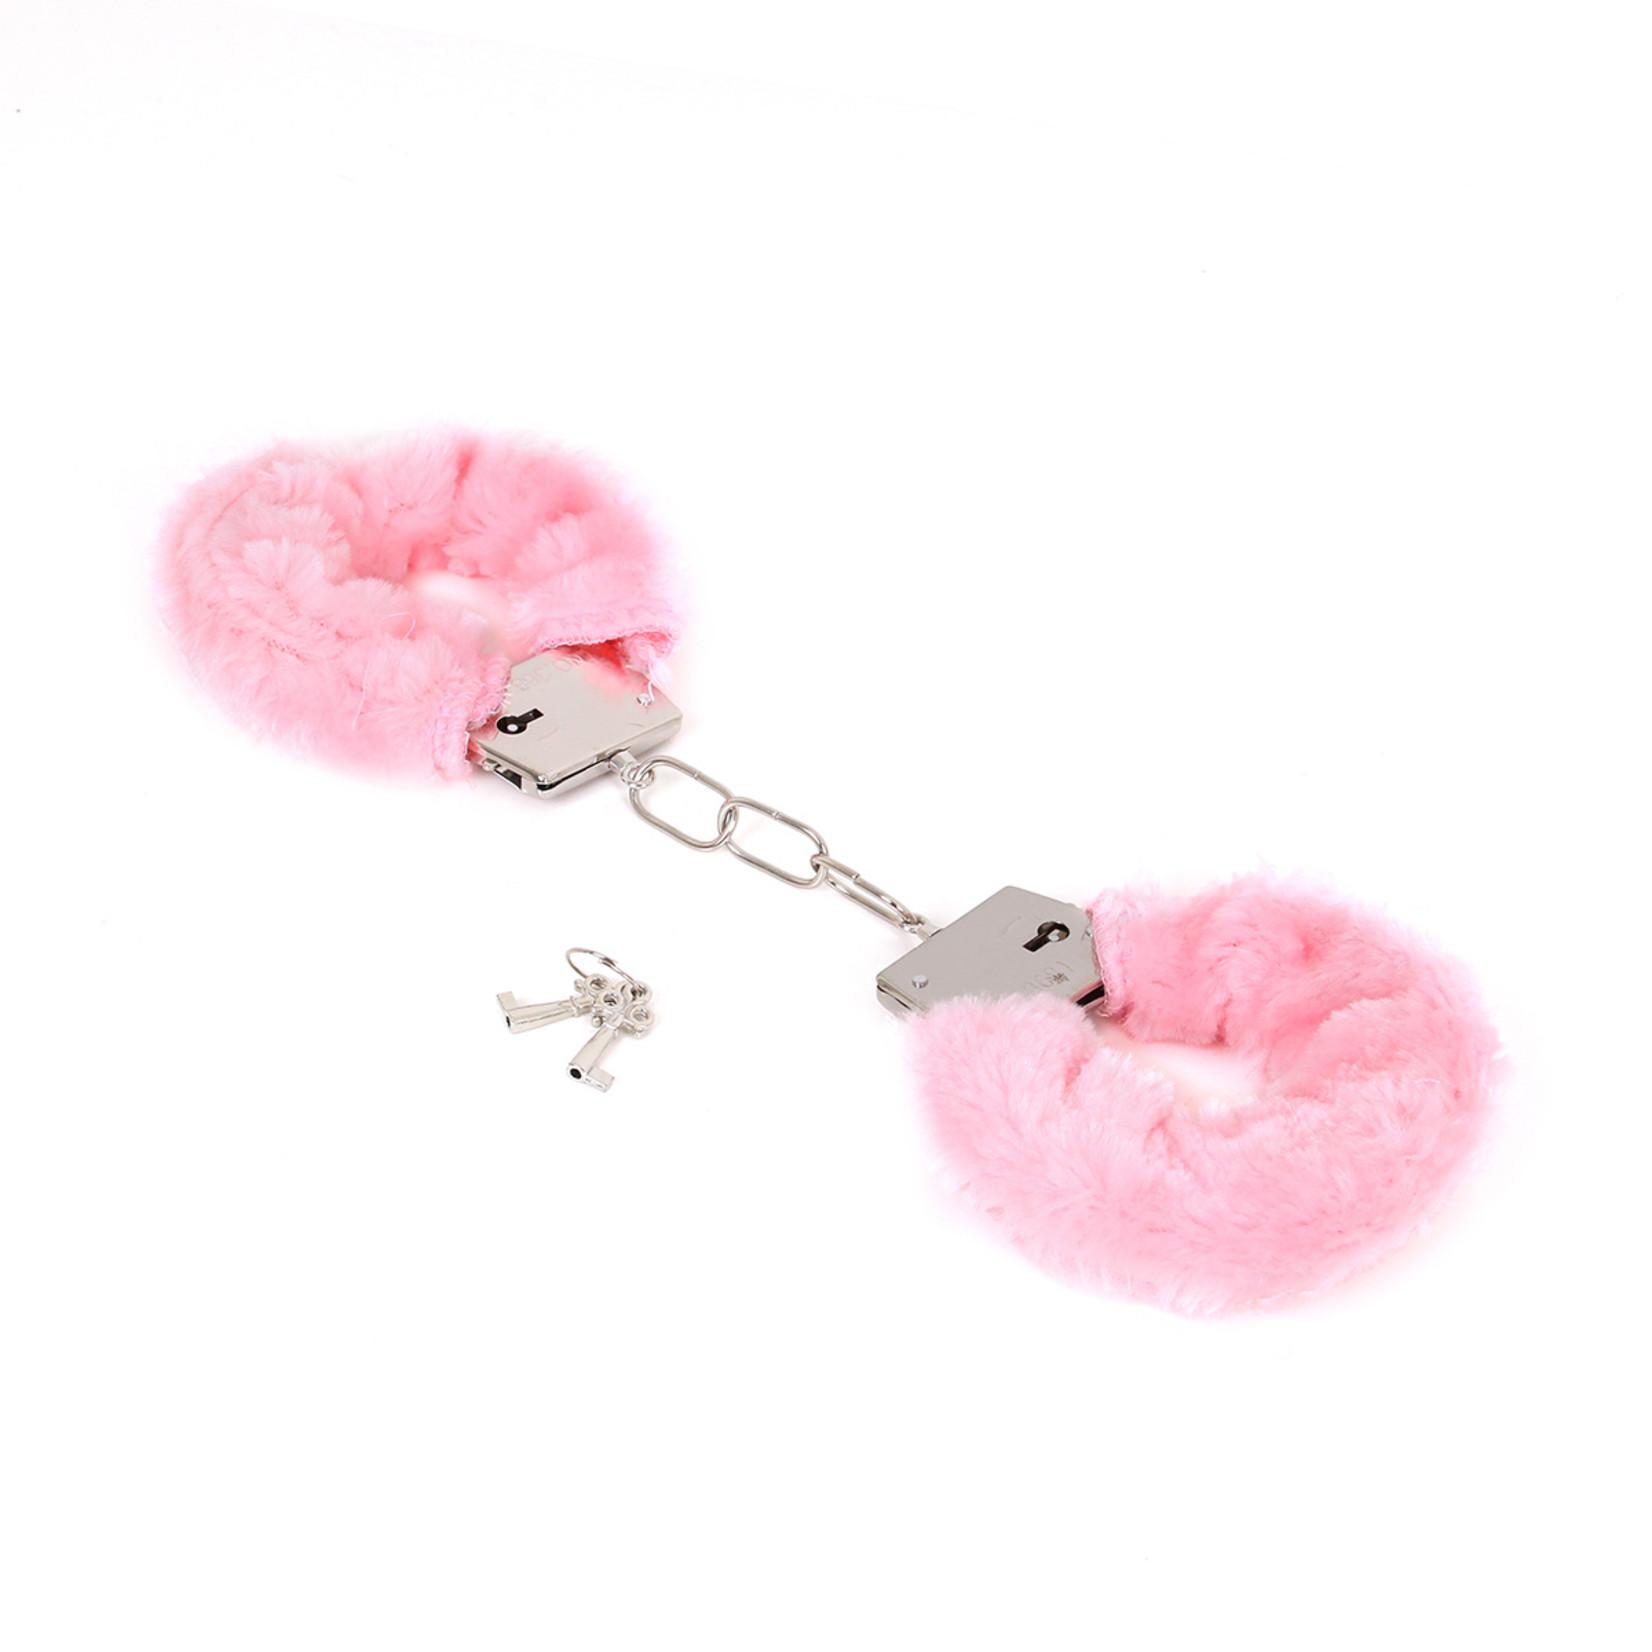 KIOTOS Steel Budget Thin-Metal Pink Plush Handboeien